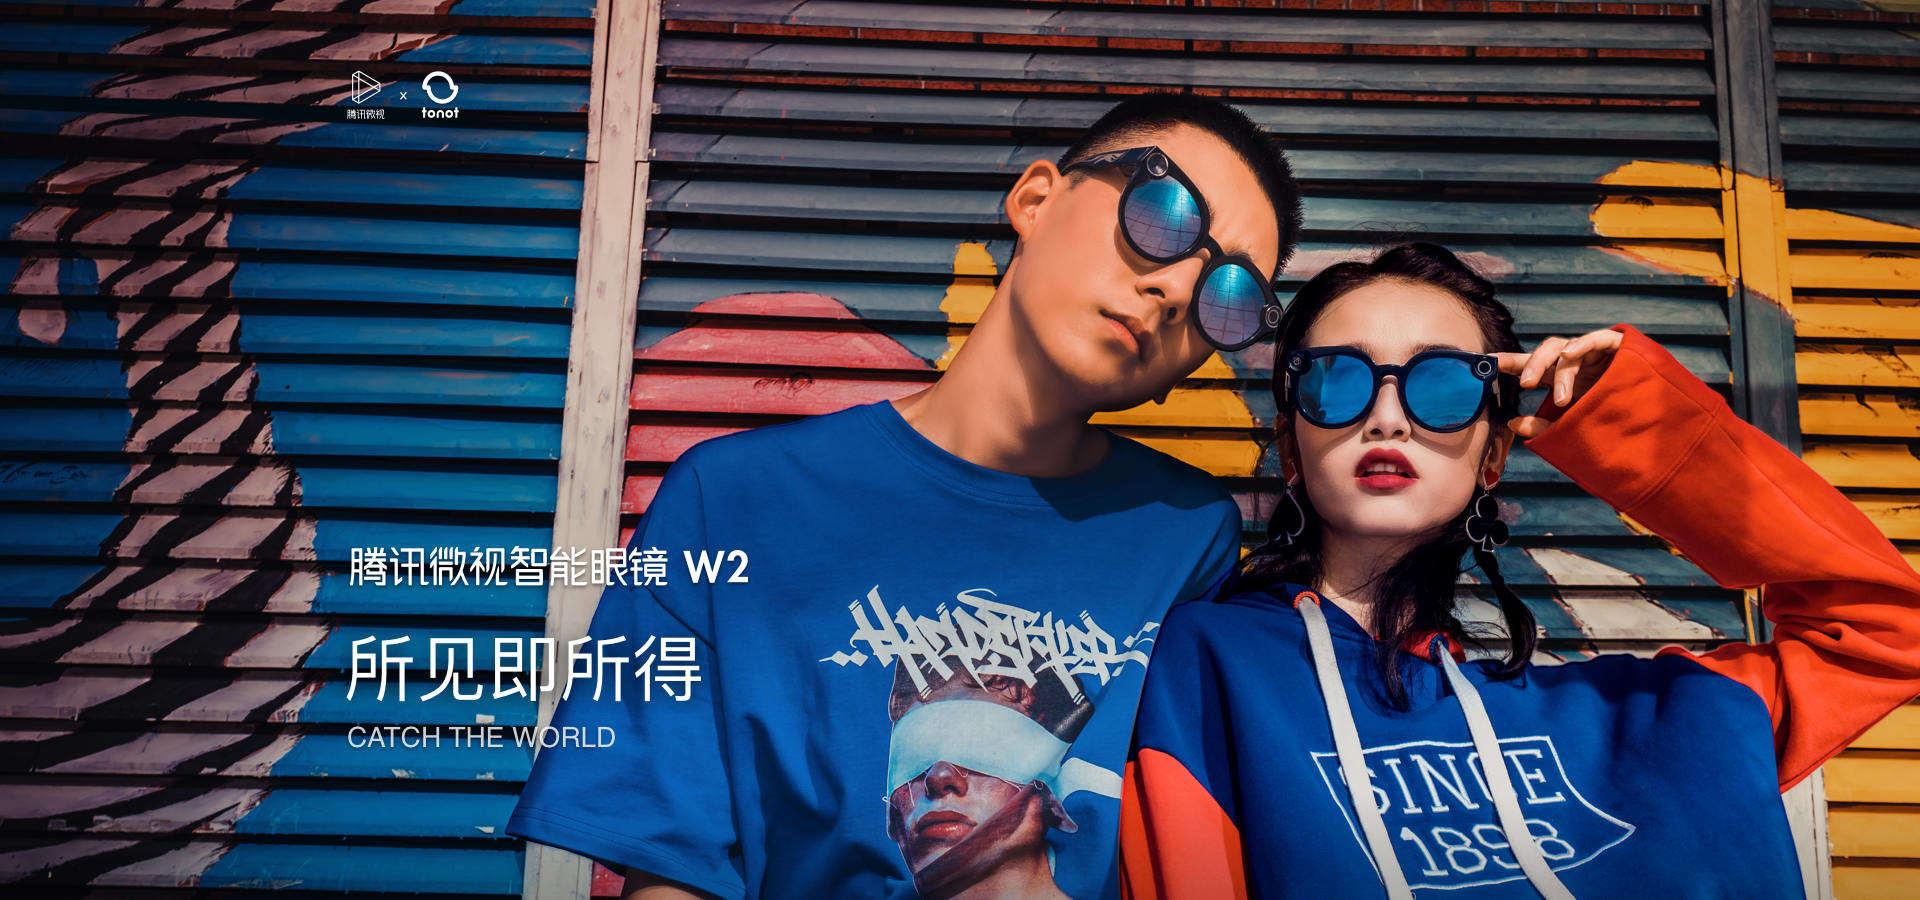 Tencent and Tonot's Weishi smartglasses.